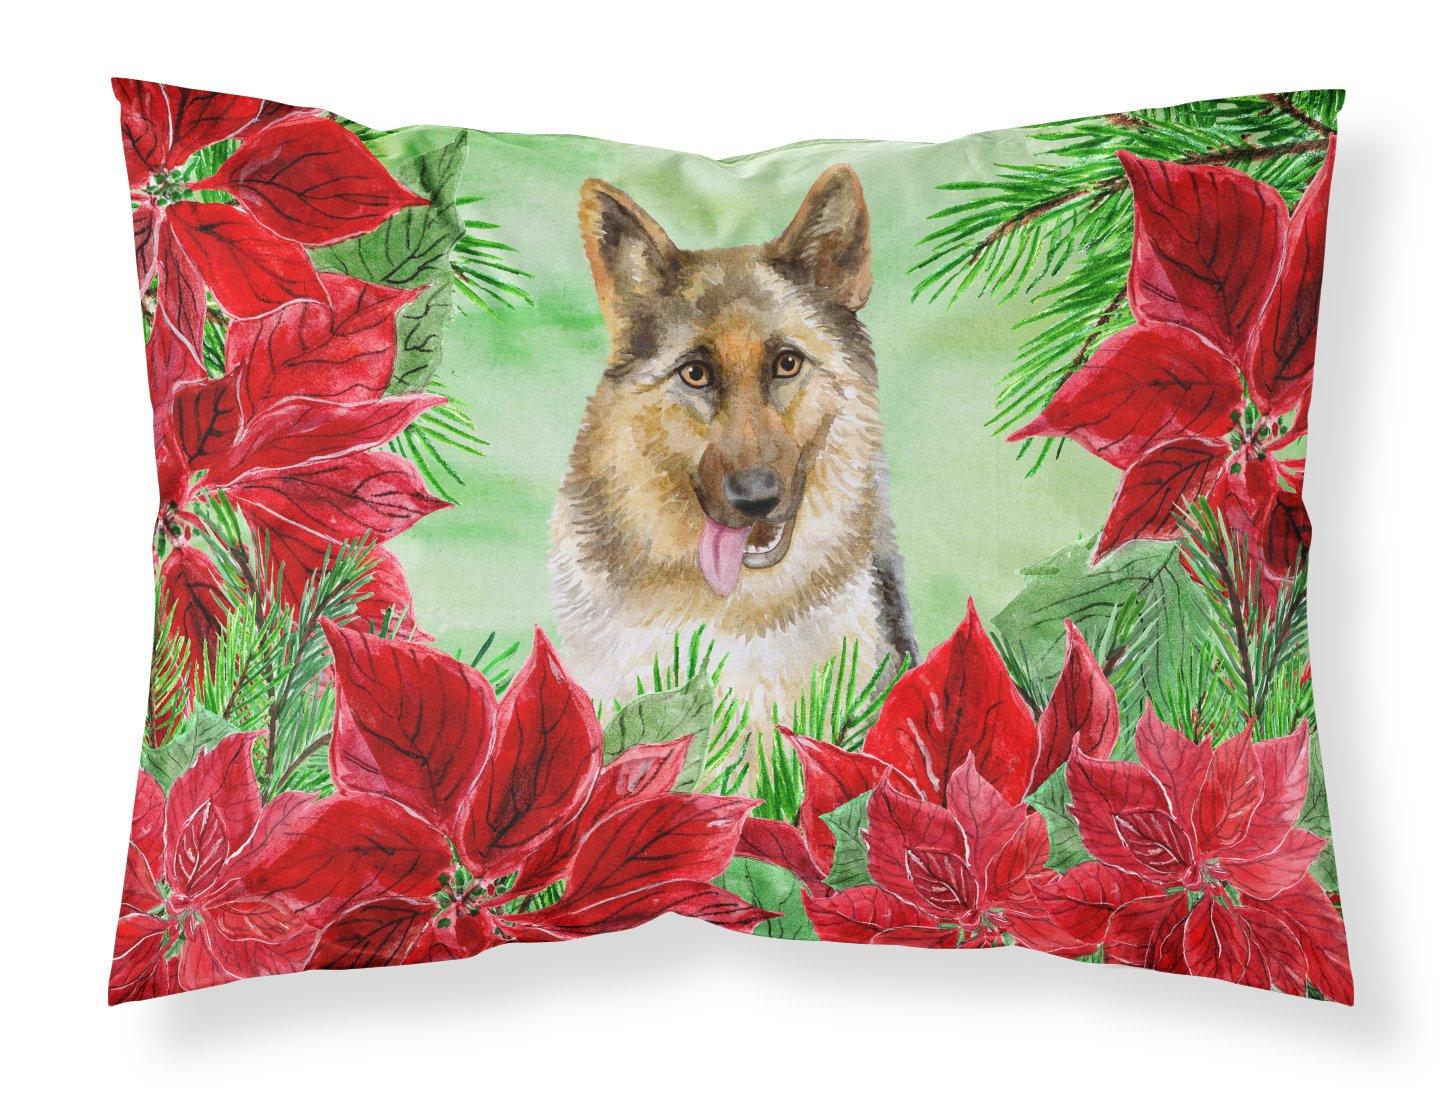 Multicolor Carolines Treasures CK1302PILLOWCASE German Shepherd Poinsettas Fabric Standard Pillowcase Standard